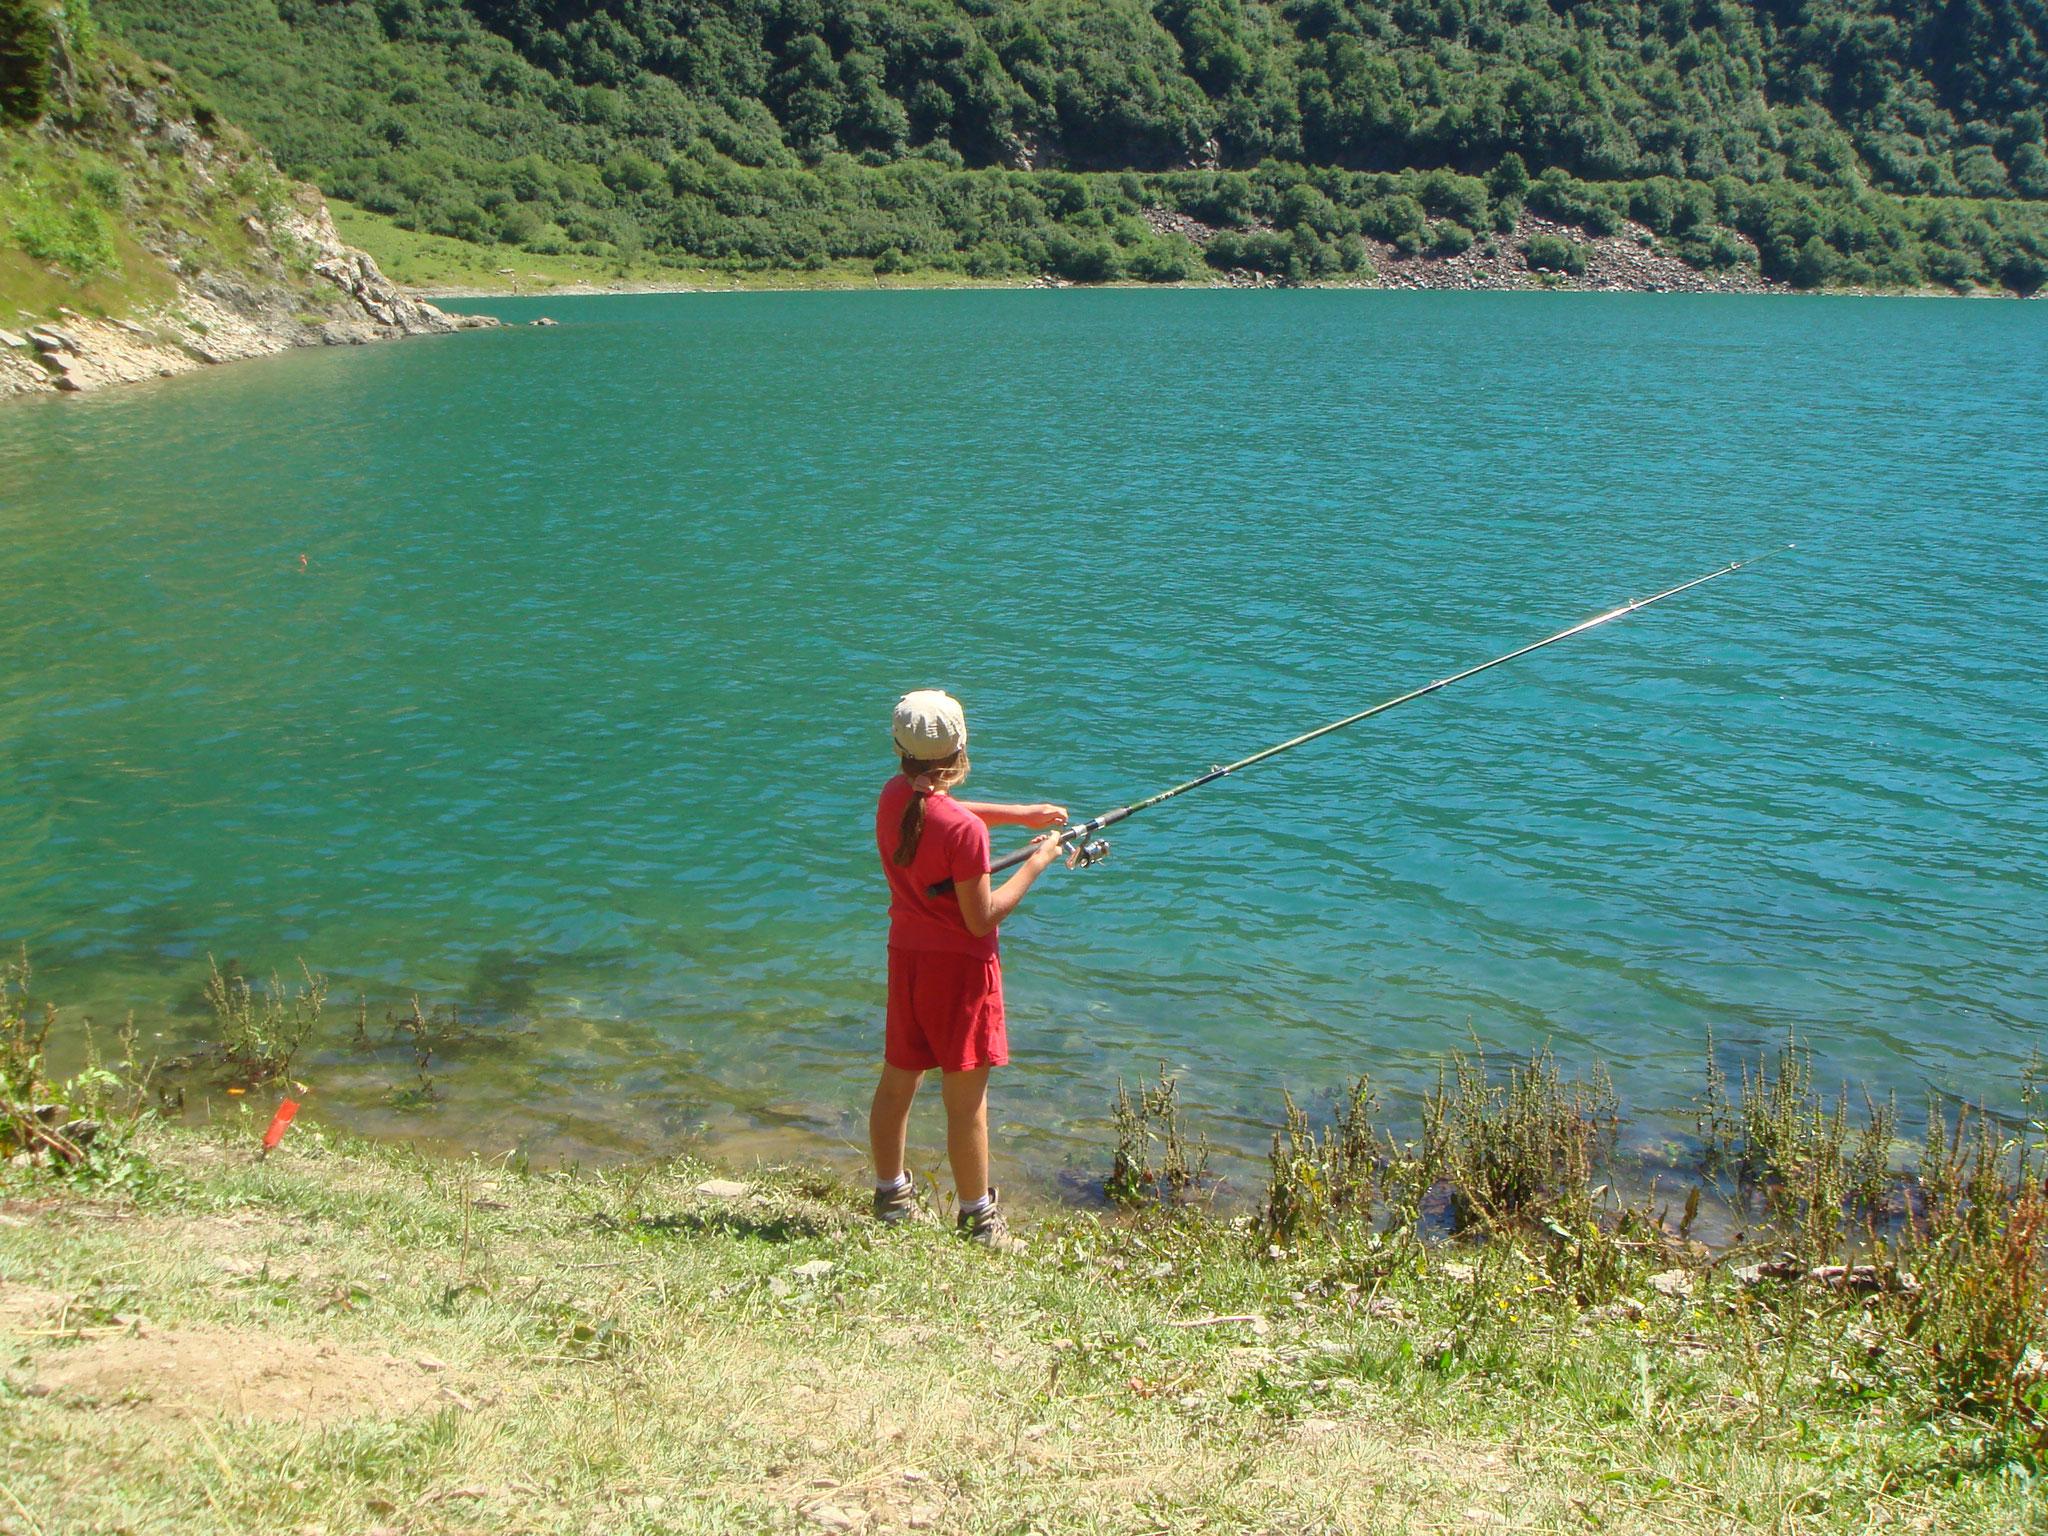 Pêche au lac